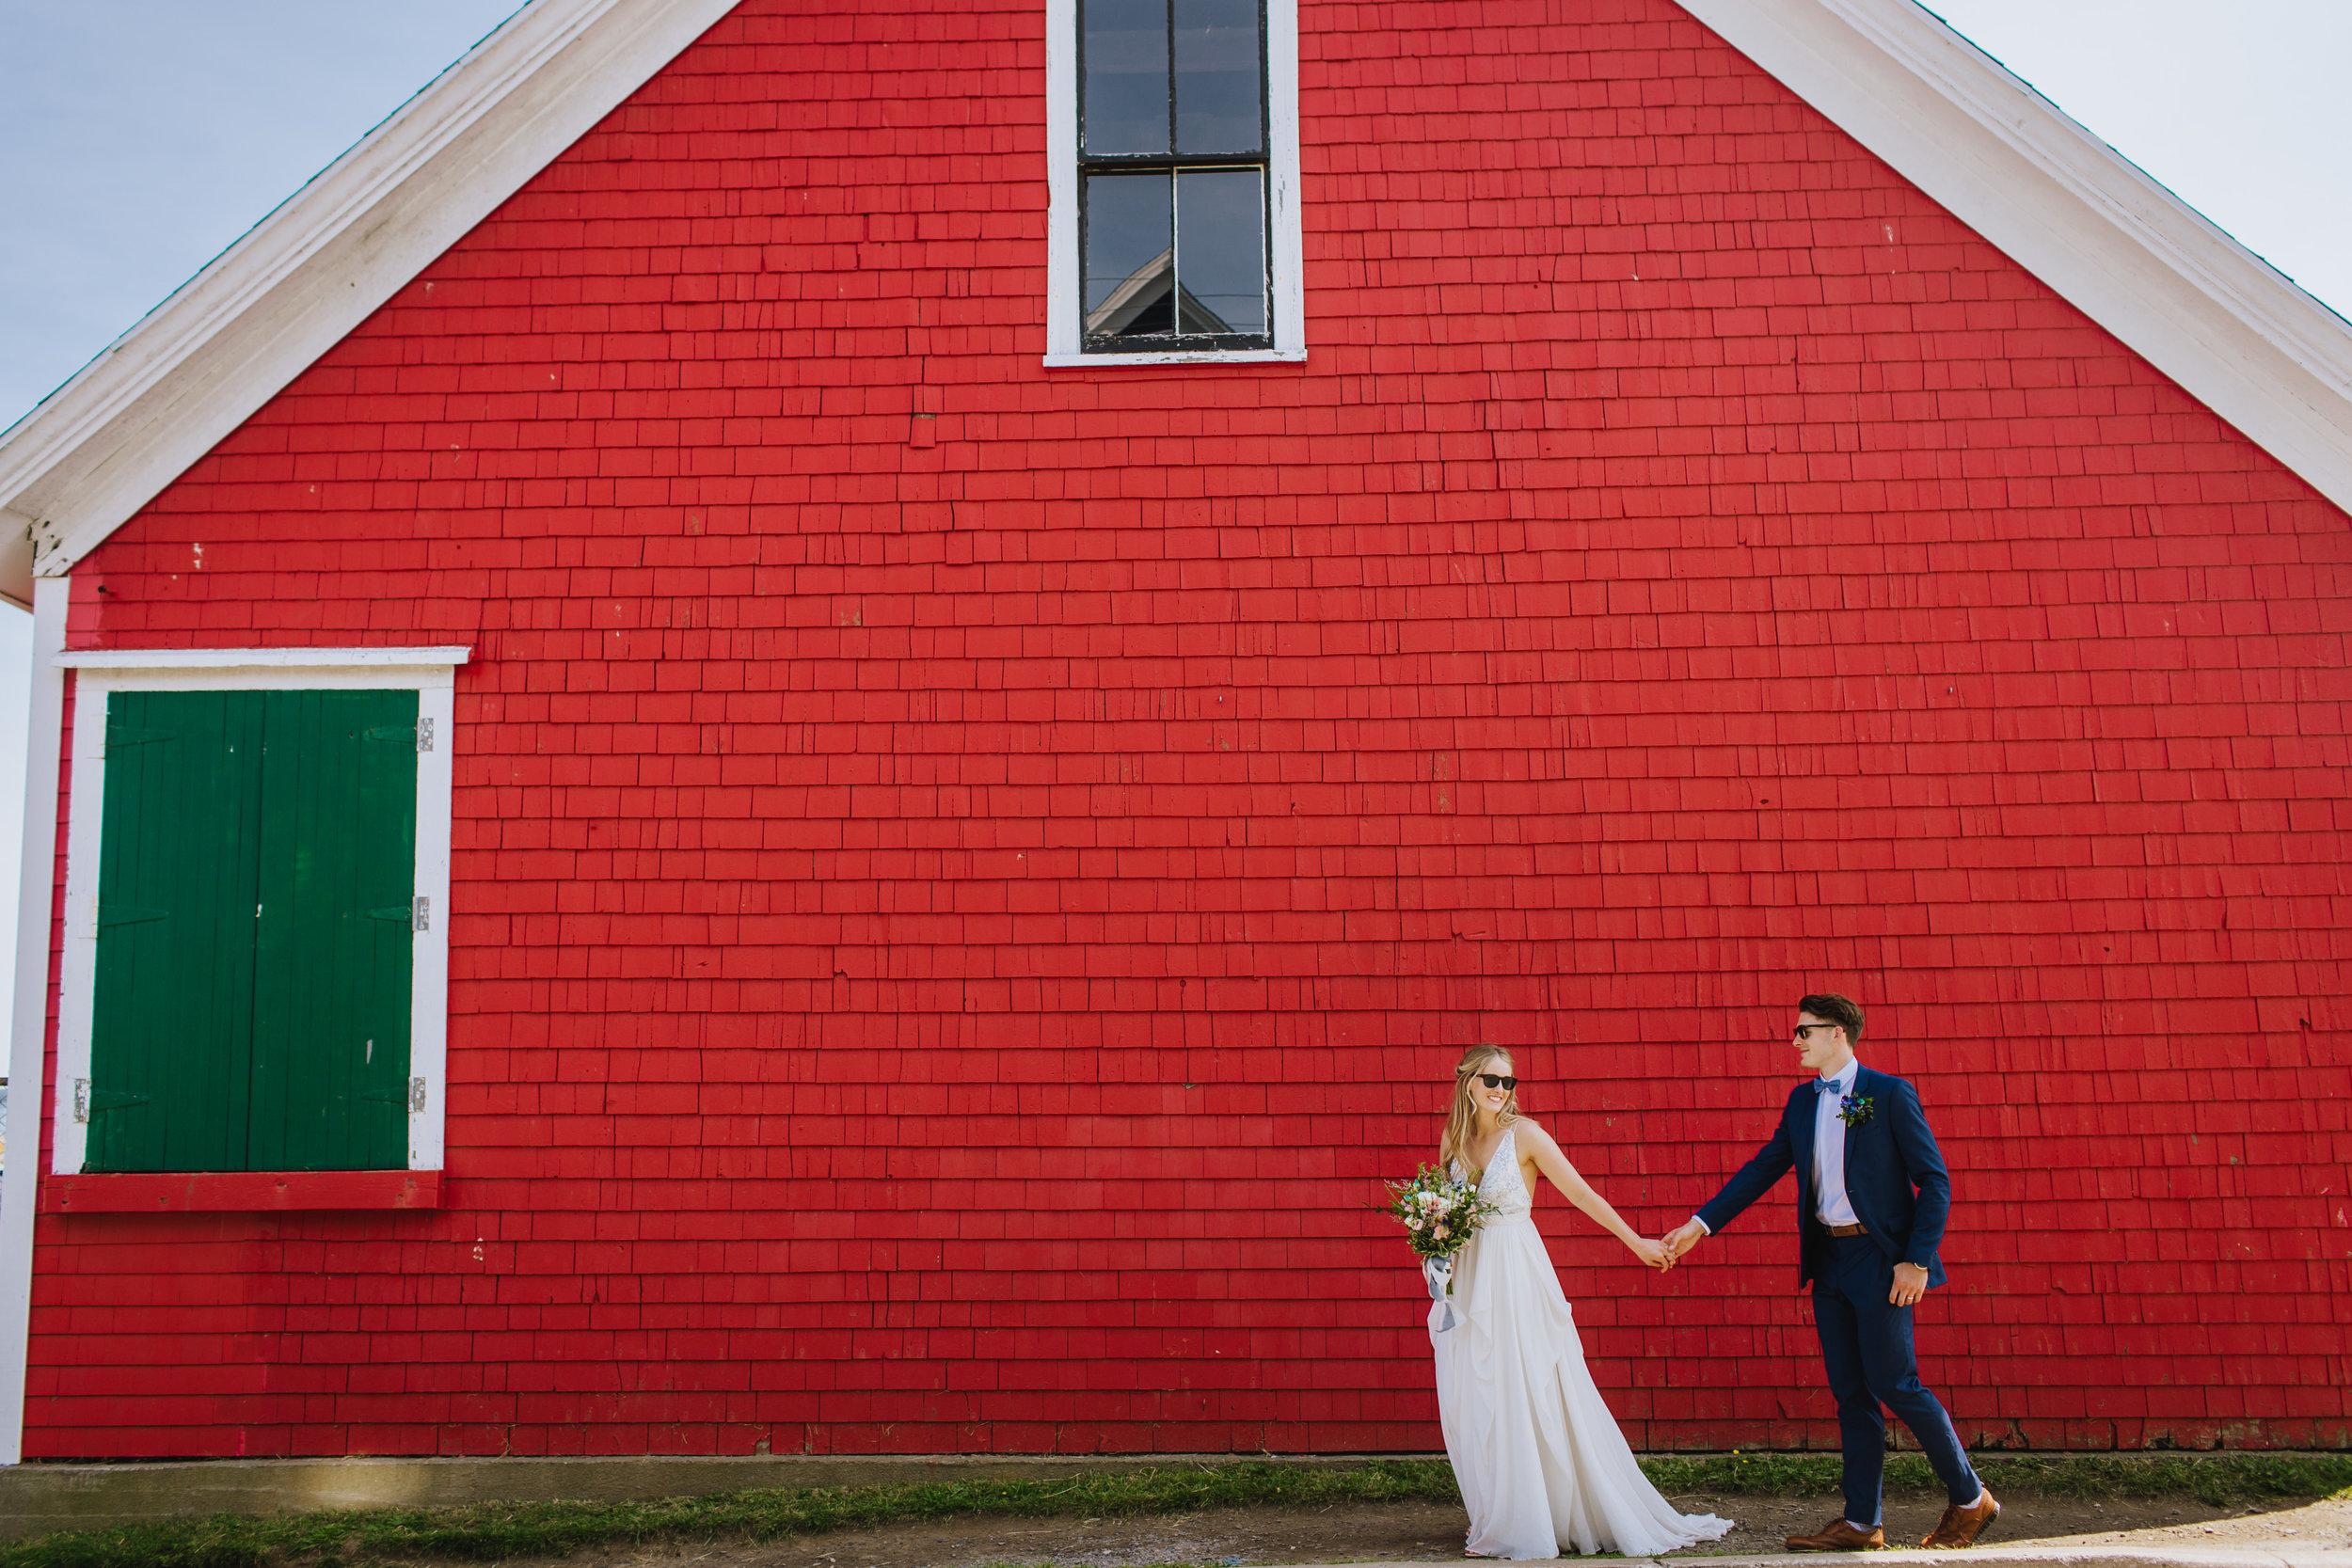 BOSCAWEN-INN-LUNENBURG-WEDDING-DAVE-AND-PRING-PHOTOGRAPHY-SOUTH-SHORE-LUNENBURG-BLUE-NOSE-BRIDE-GROOM